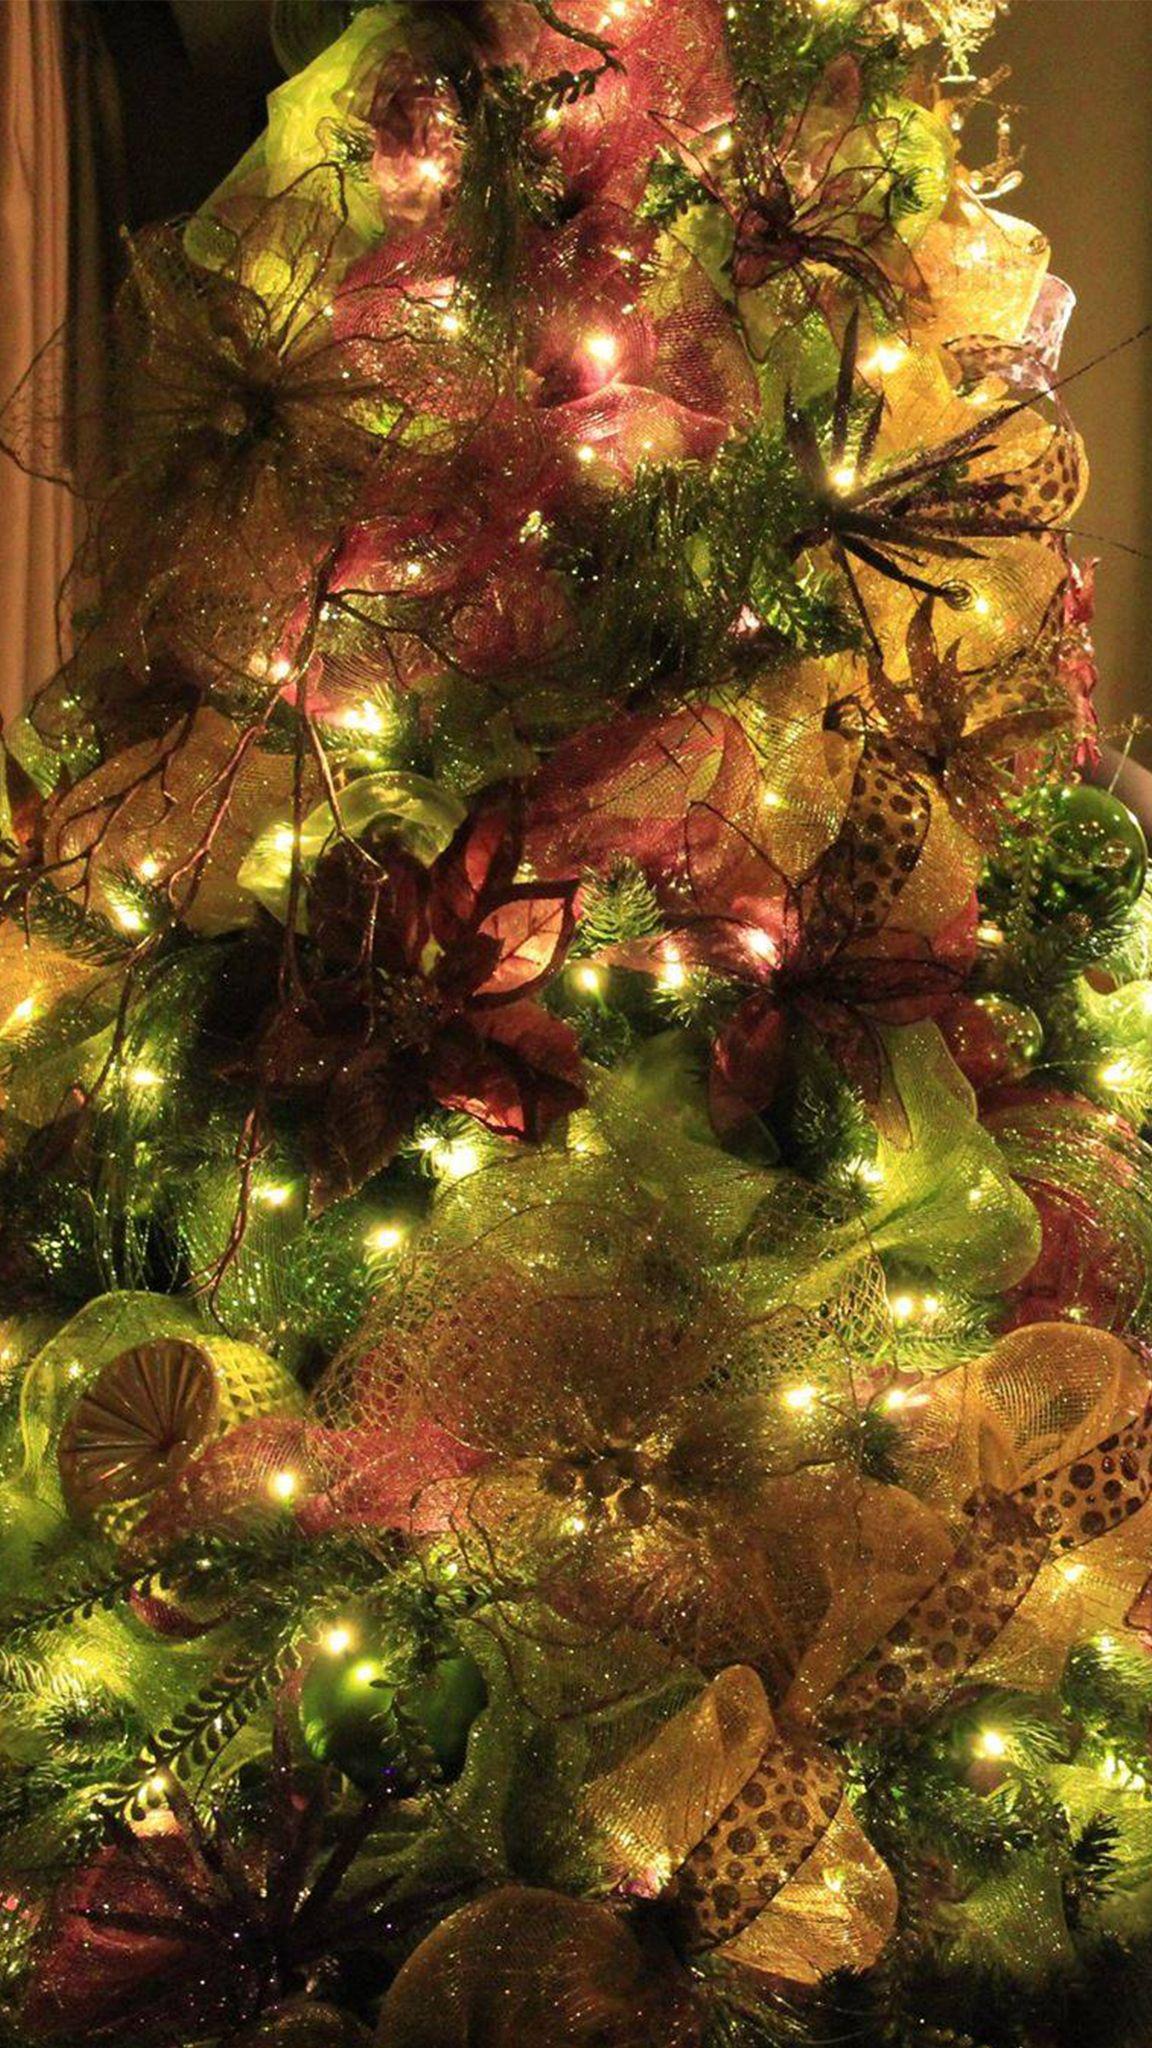 Bespoke Christmas tree decorations for Christmas venue